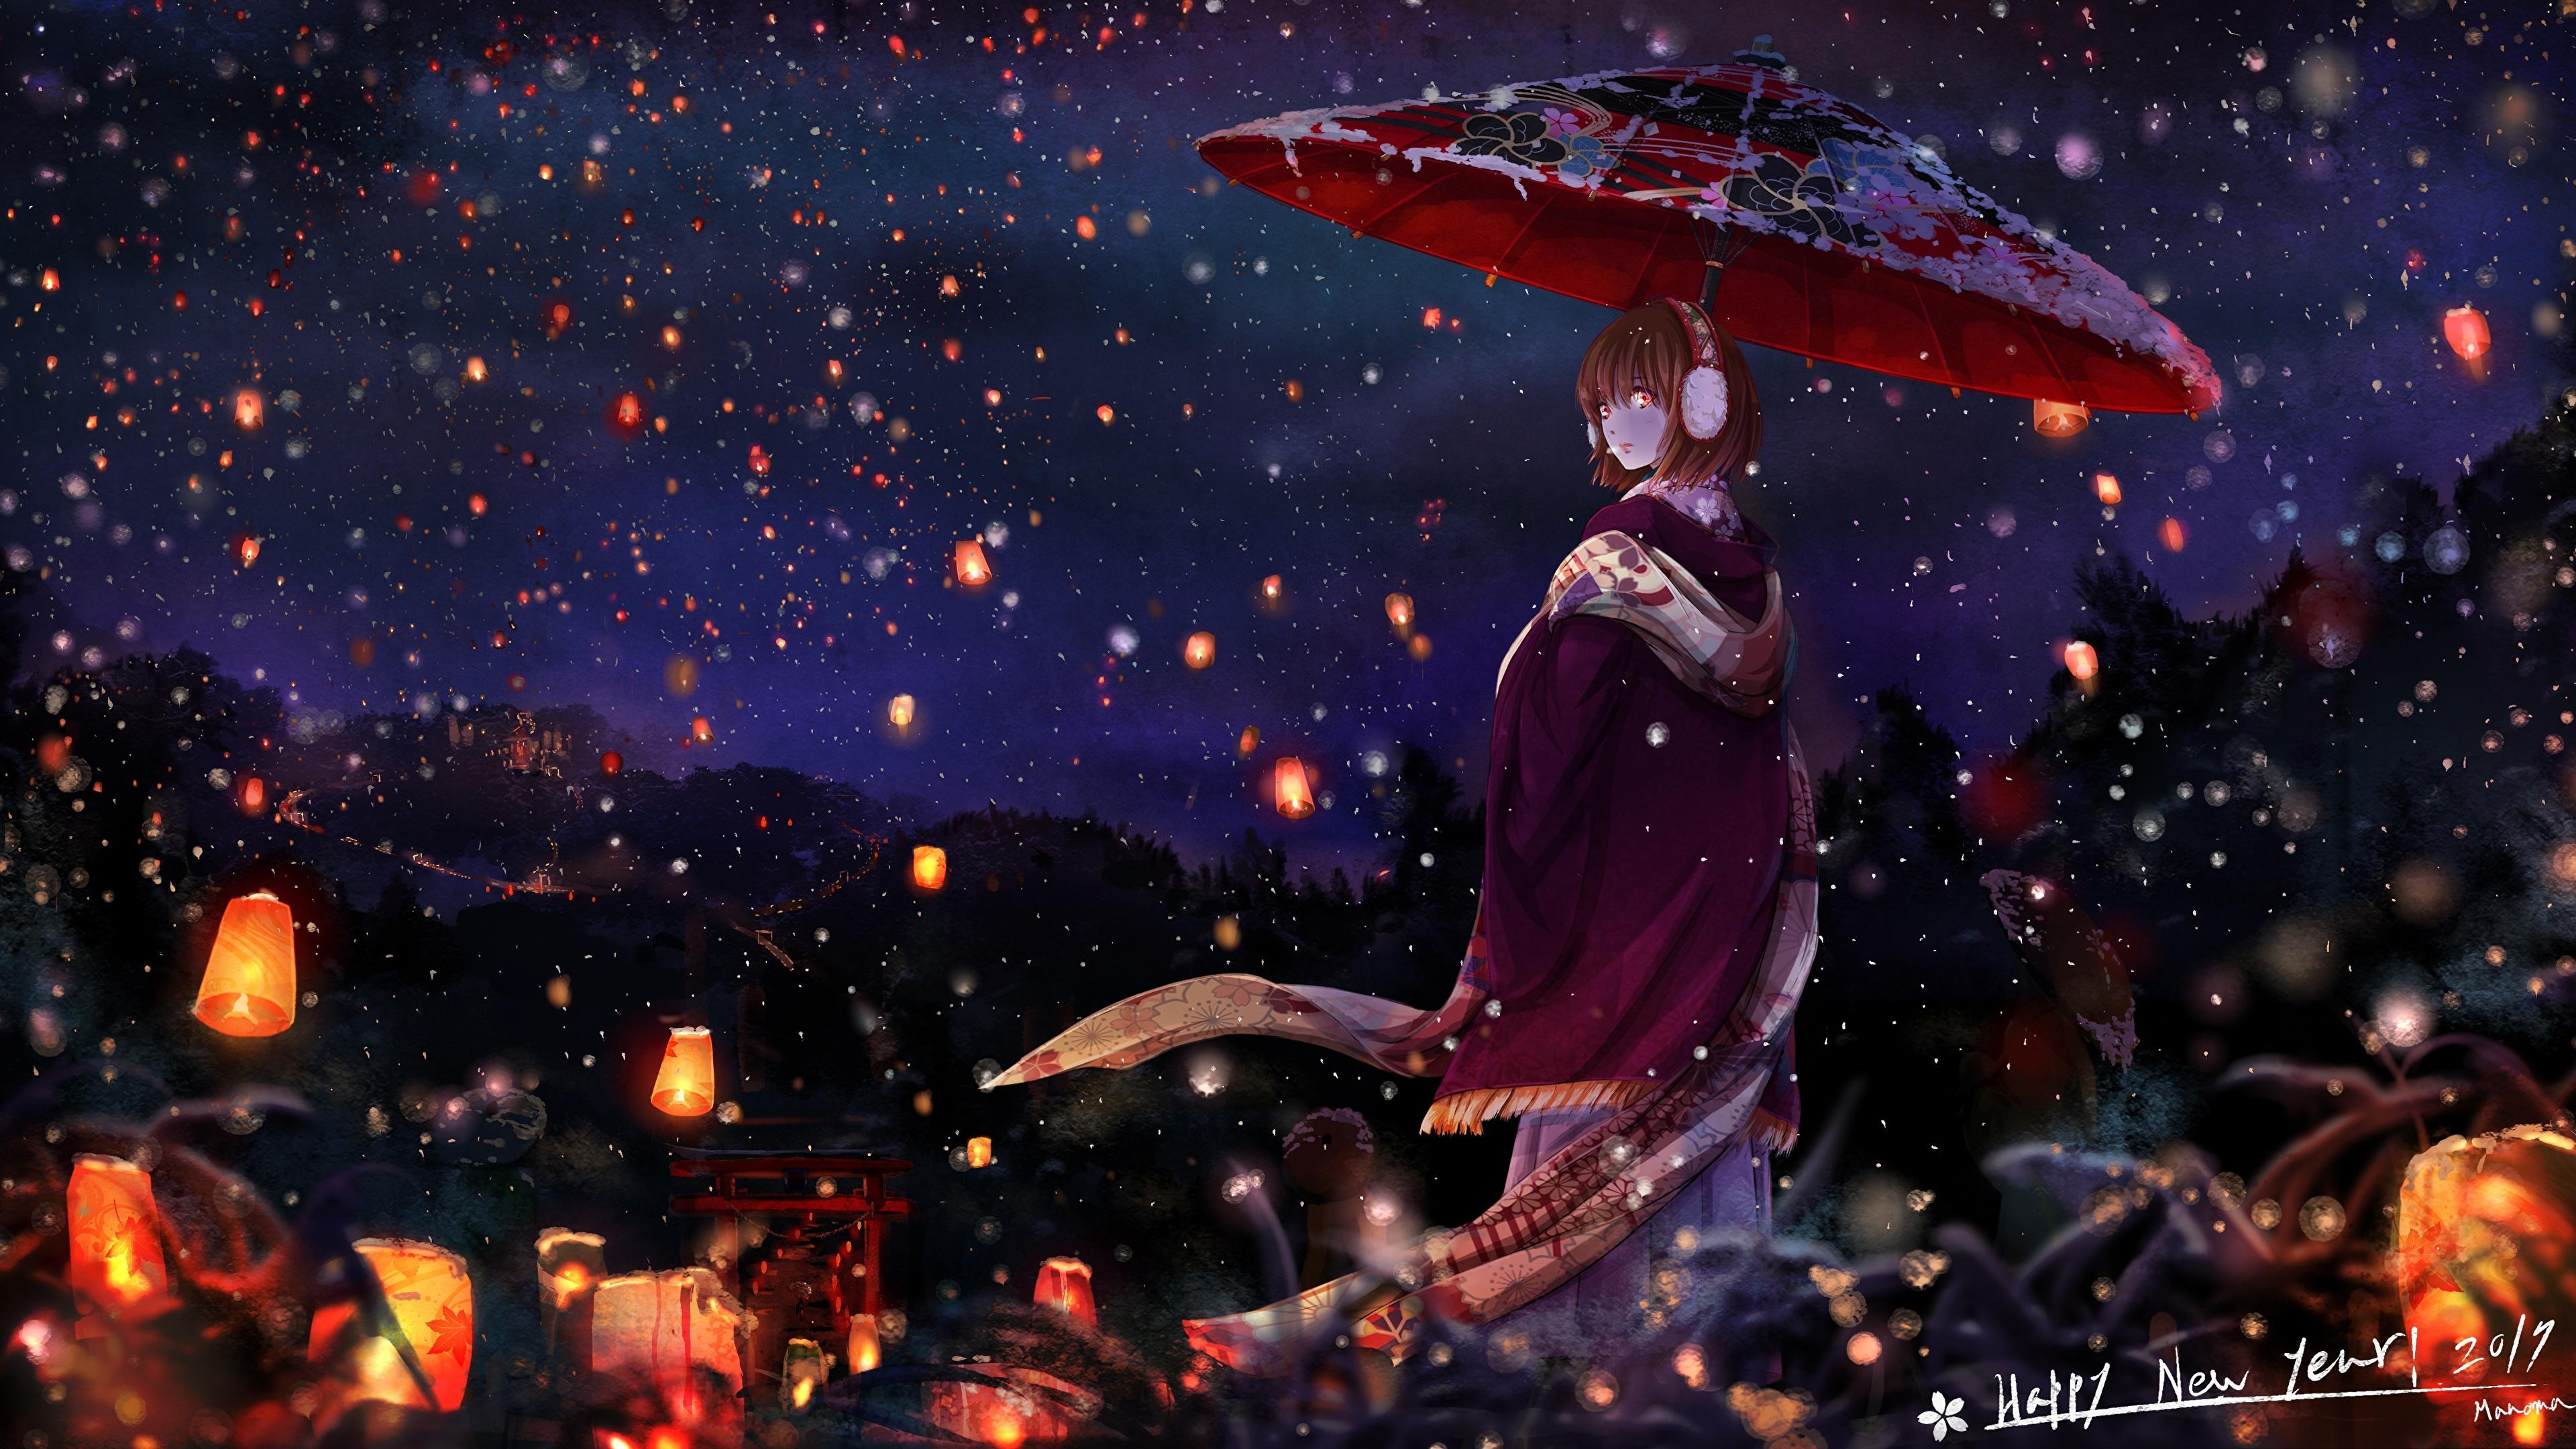 Picture Lantern Kimono Anime Young Woman Night Umbrella 3840x2160